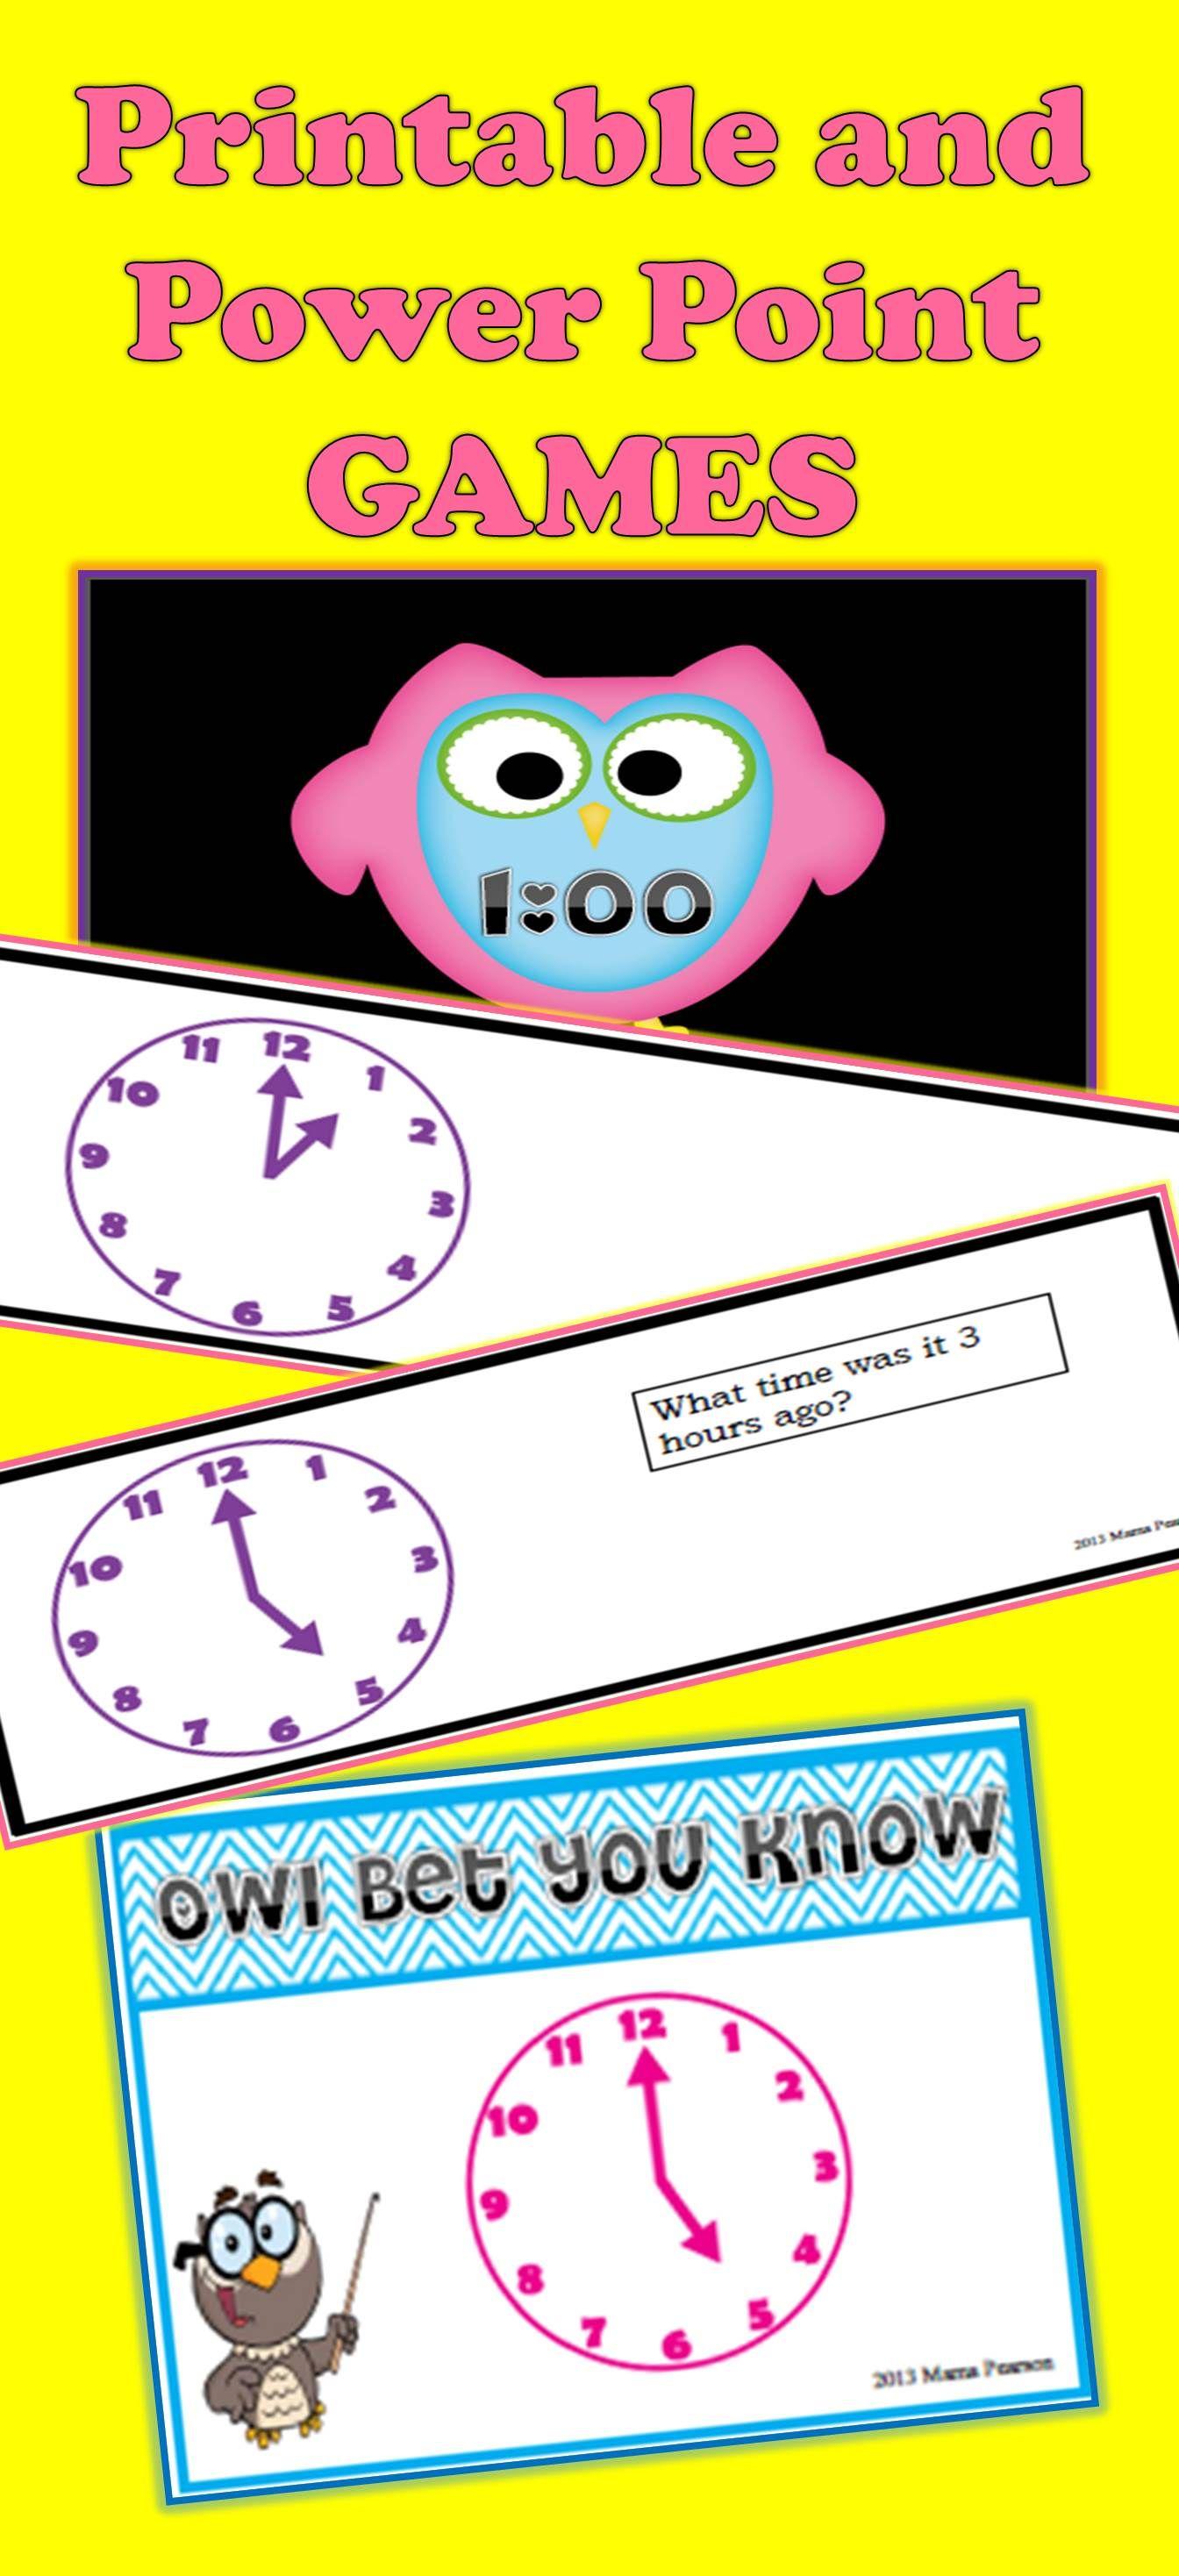 Time To The Hour Games Bundle Homeschool Math Reading Tutoring Teachers Toolbox [ 2937 x 1344 Pixel ]